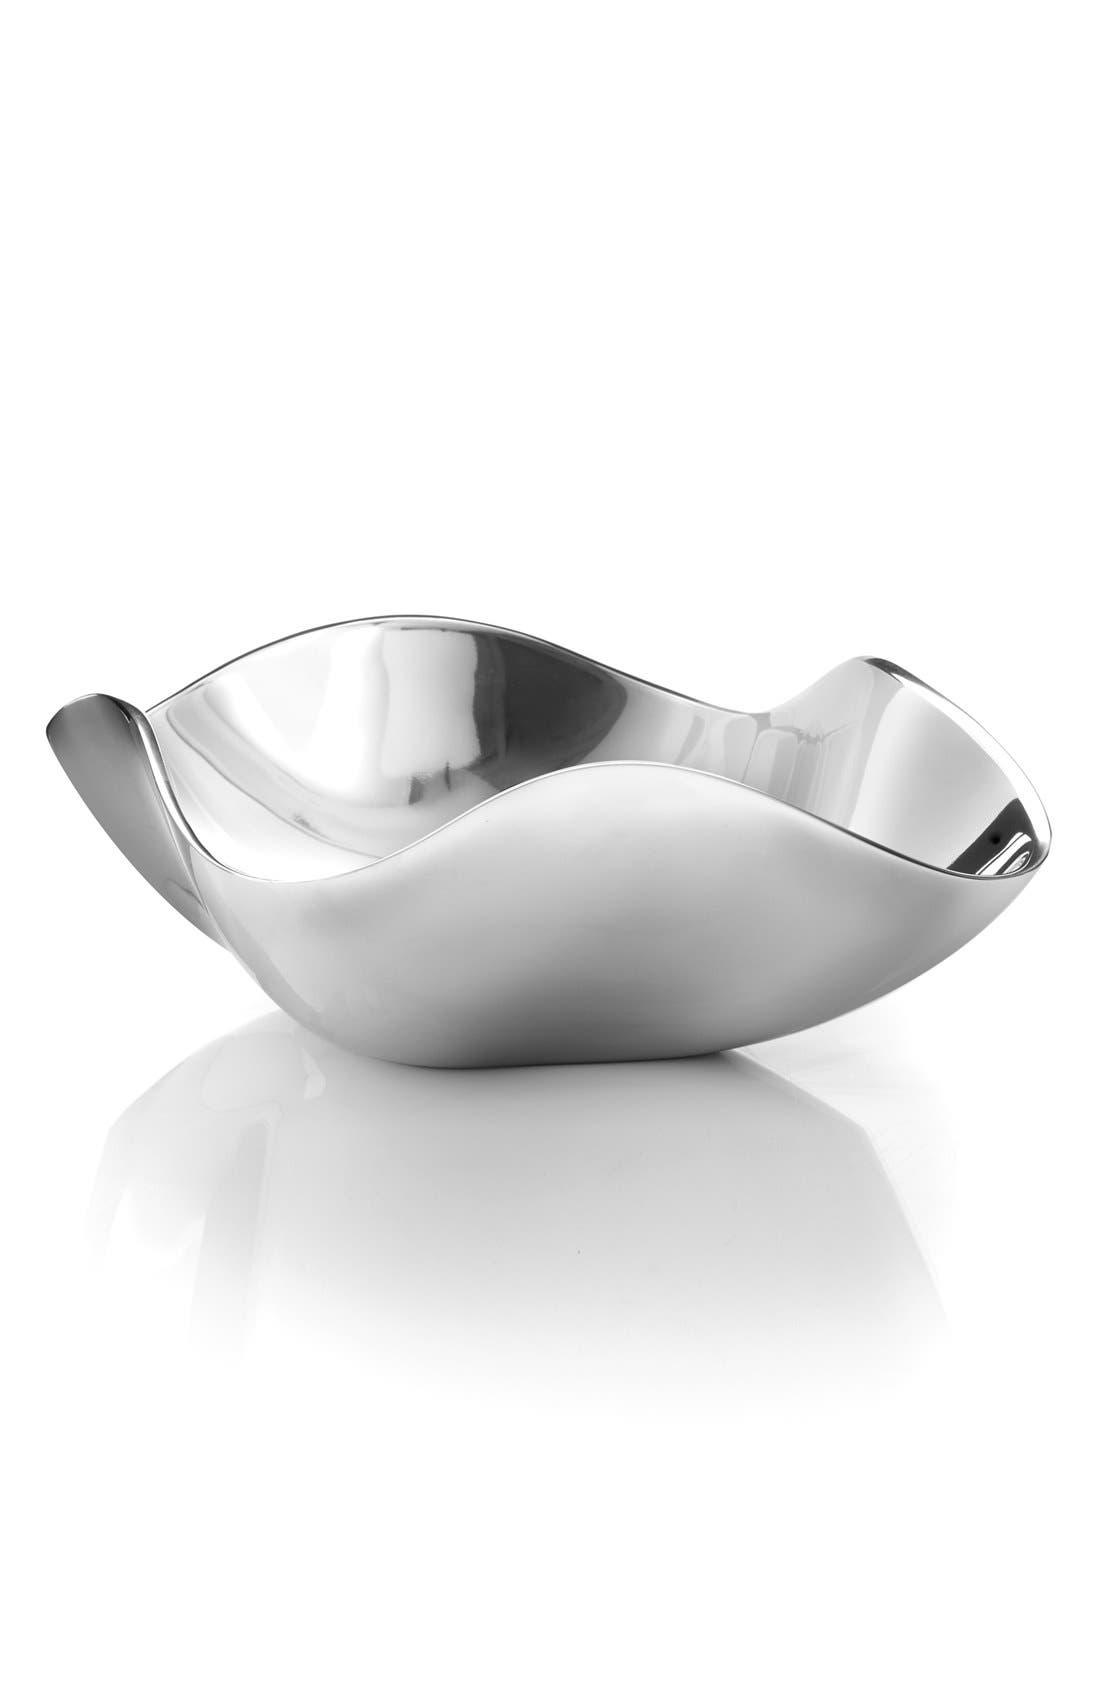 namb oceana serving bowl